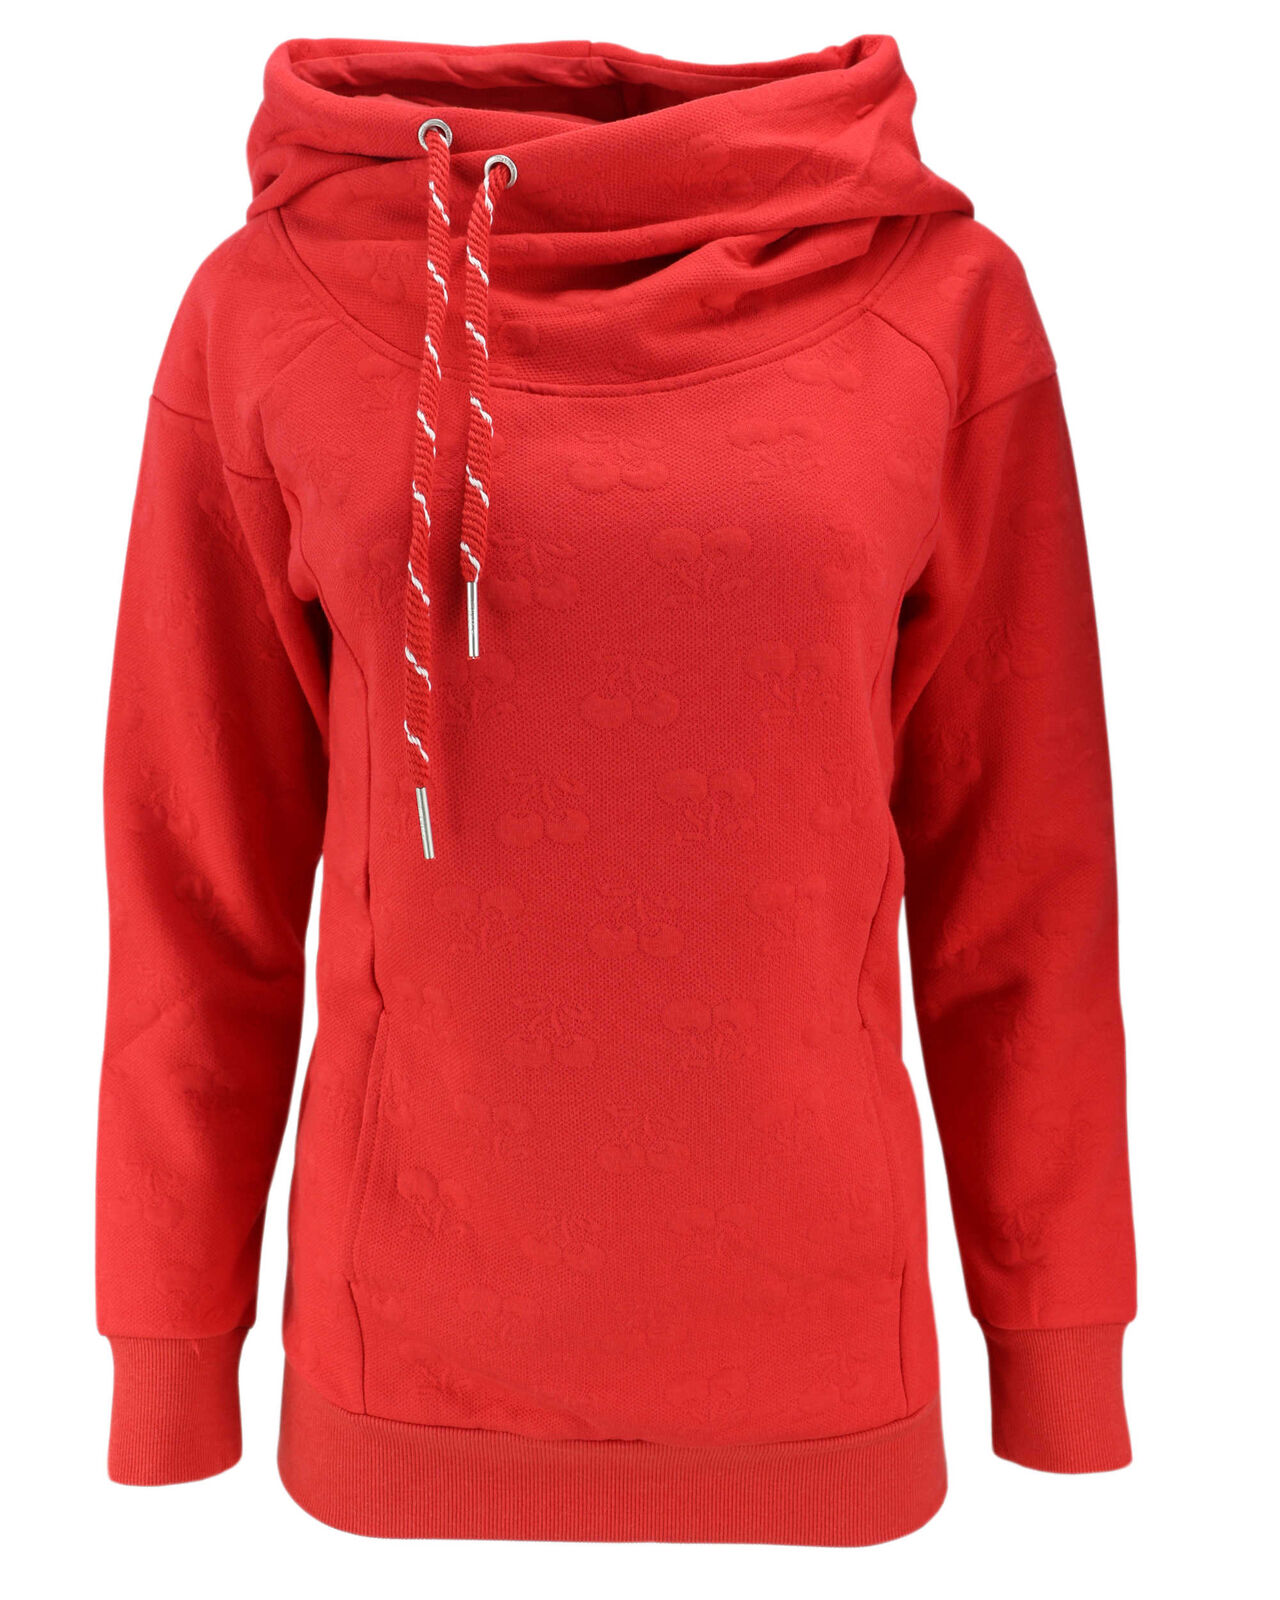 ONLY Damen Sweatshirt Pullover onlCAMMI L/S HOOD Hoodie Sweat Kapuze Kirschen